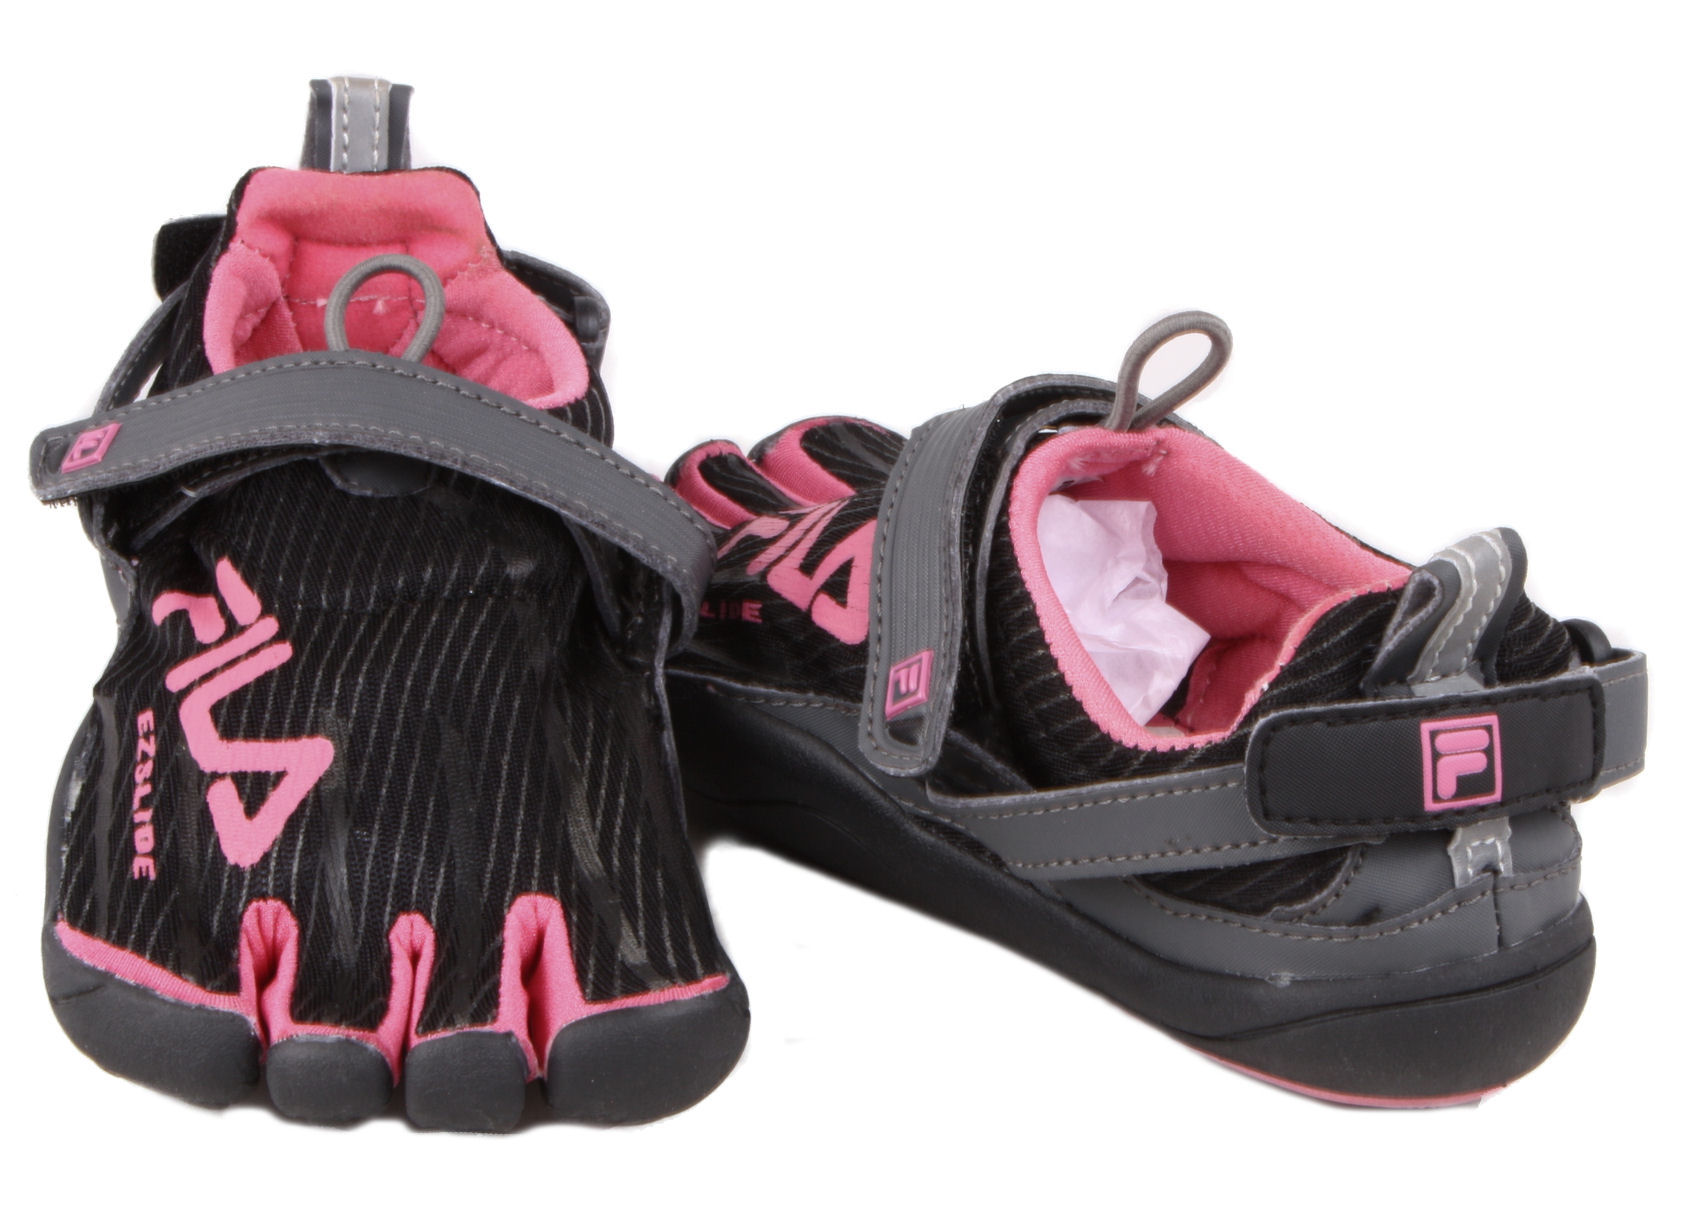 Fila Women's Skele-Toes EZ Slide Shoes - Grey/Purple - Polyvore